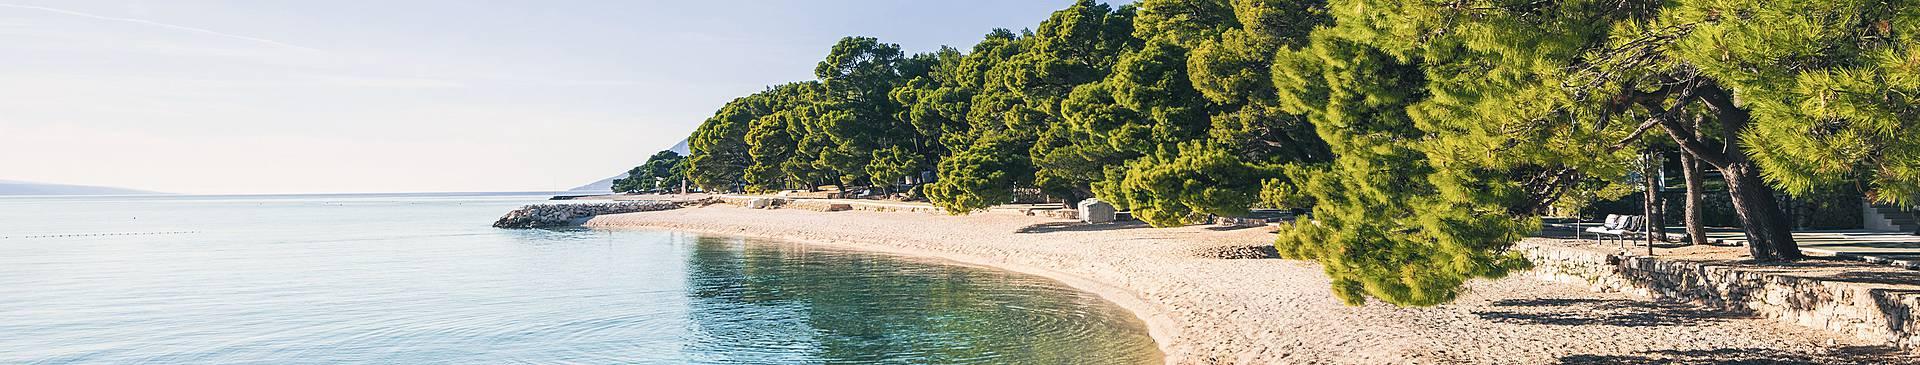 Voyage plage en Croatie